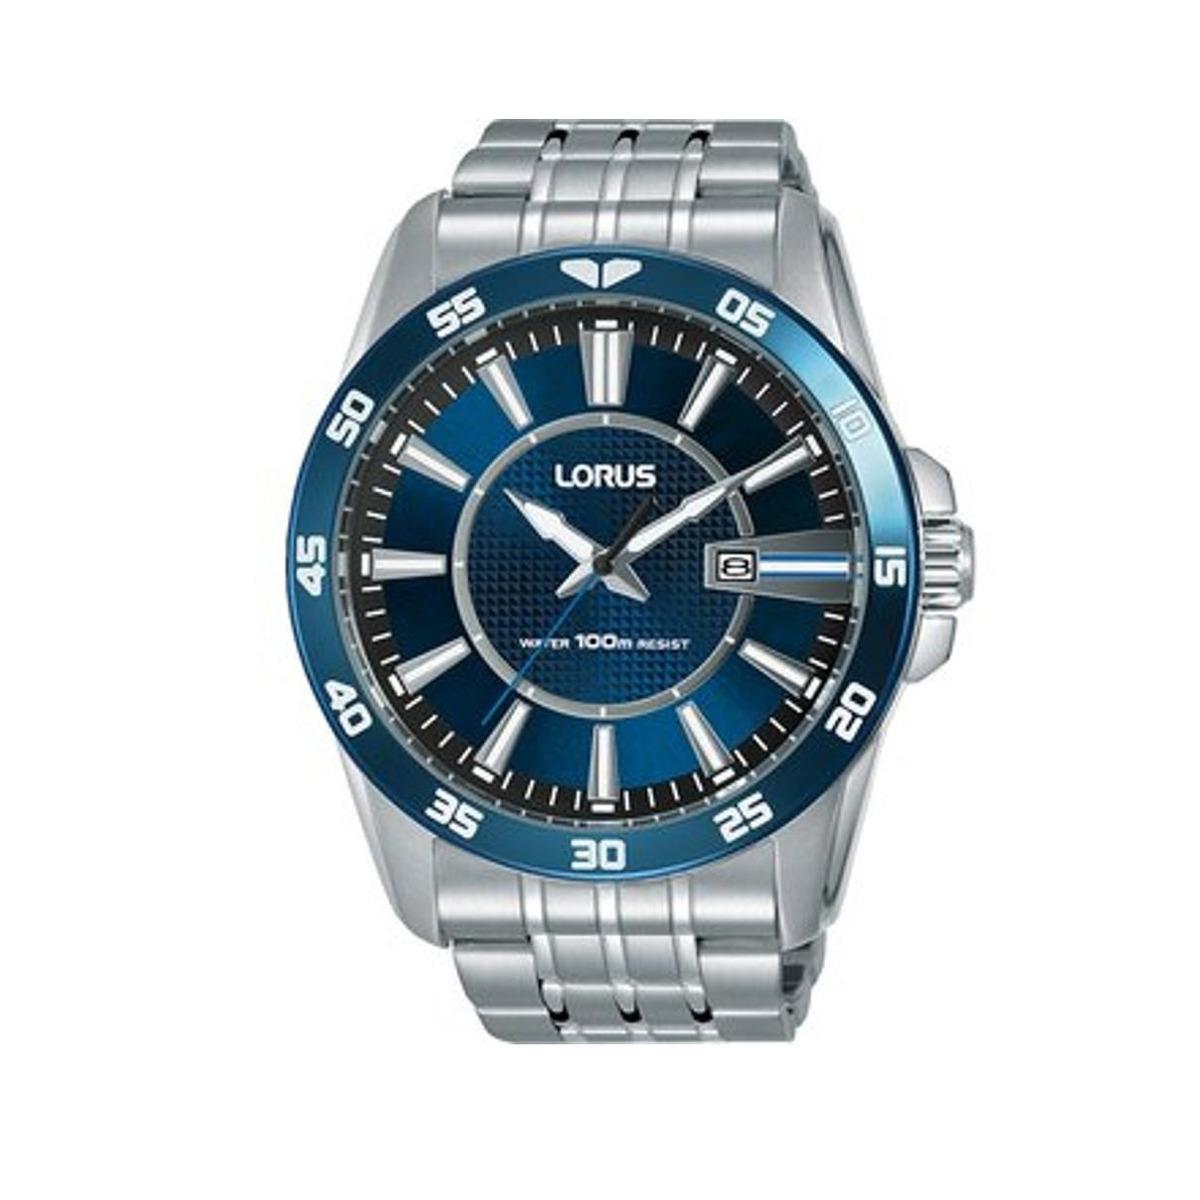 ea2ed1babe2c Reloj Para Caballero De Pulsera Reloj Lorus Cuarzo Rh963hx9 ...